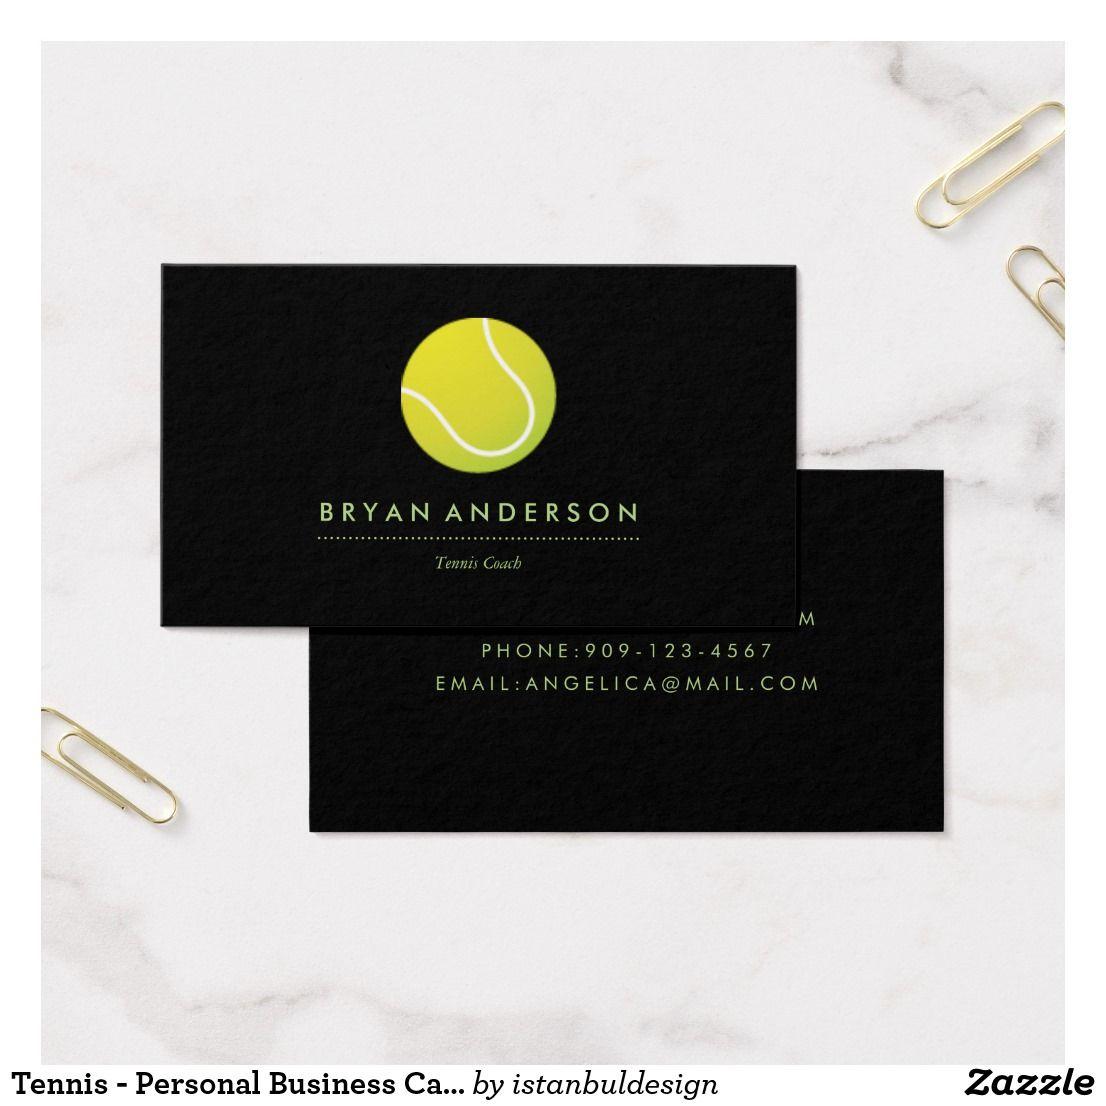 Tennis - Personal Business Card | Business | Pinterest | Business cards